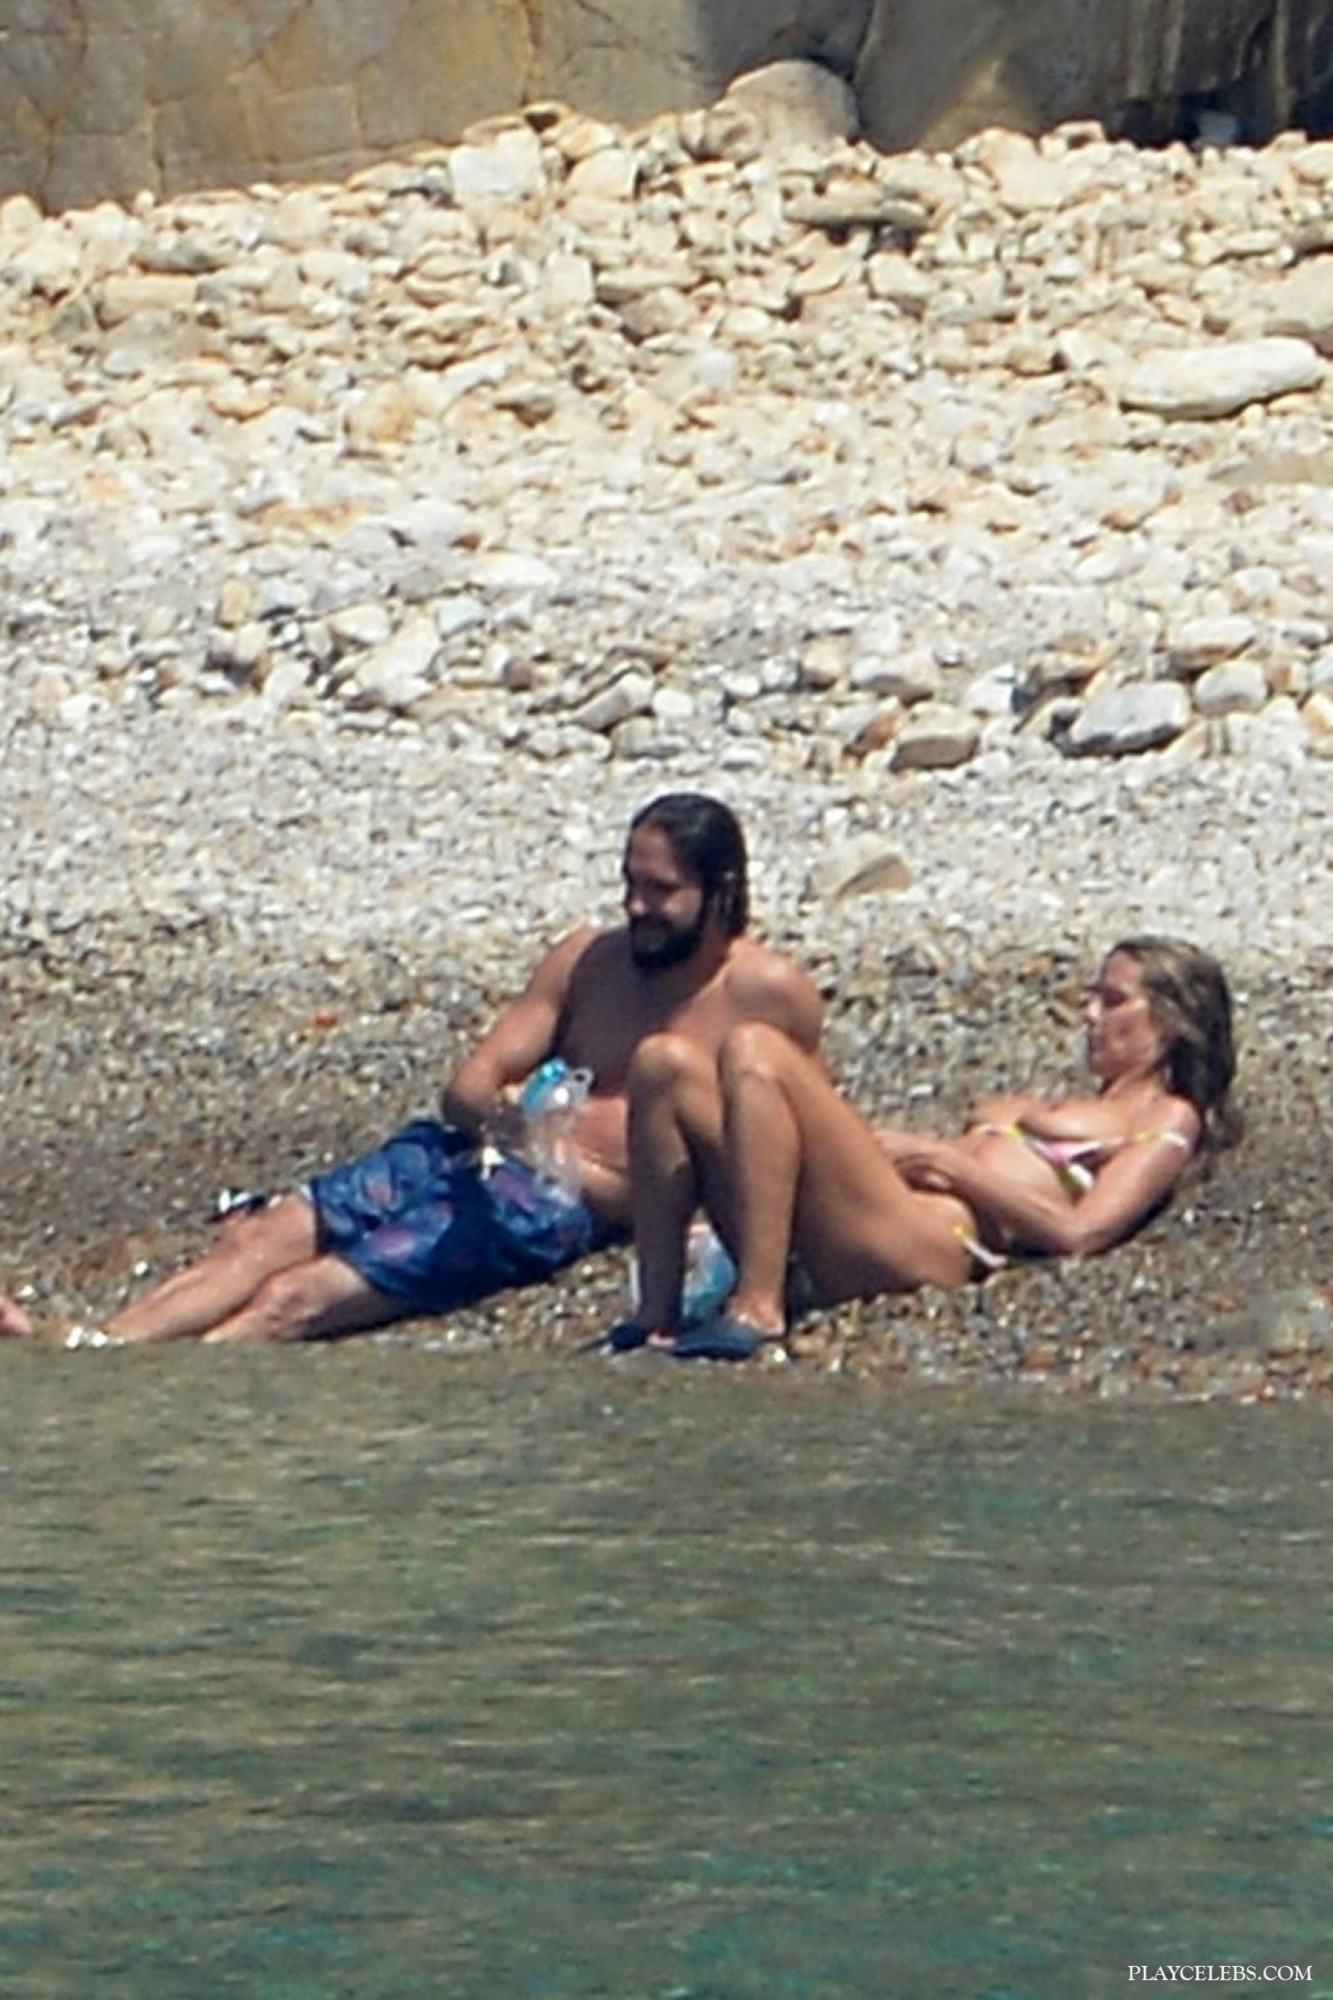 Heidi Klum Relaxing Topless With Her New Boyfriend